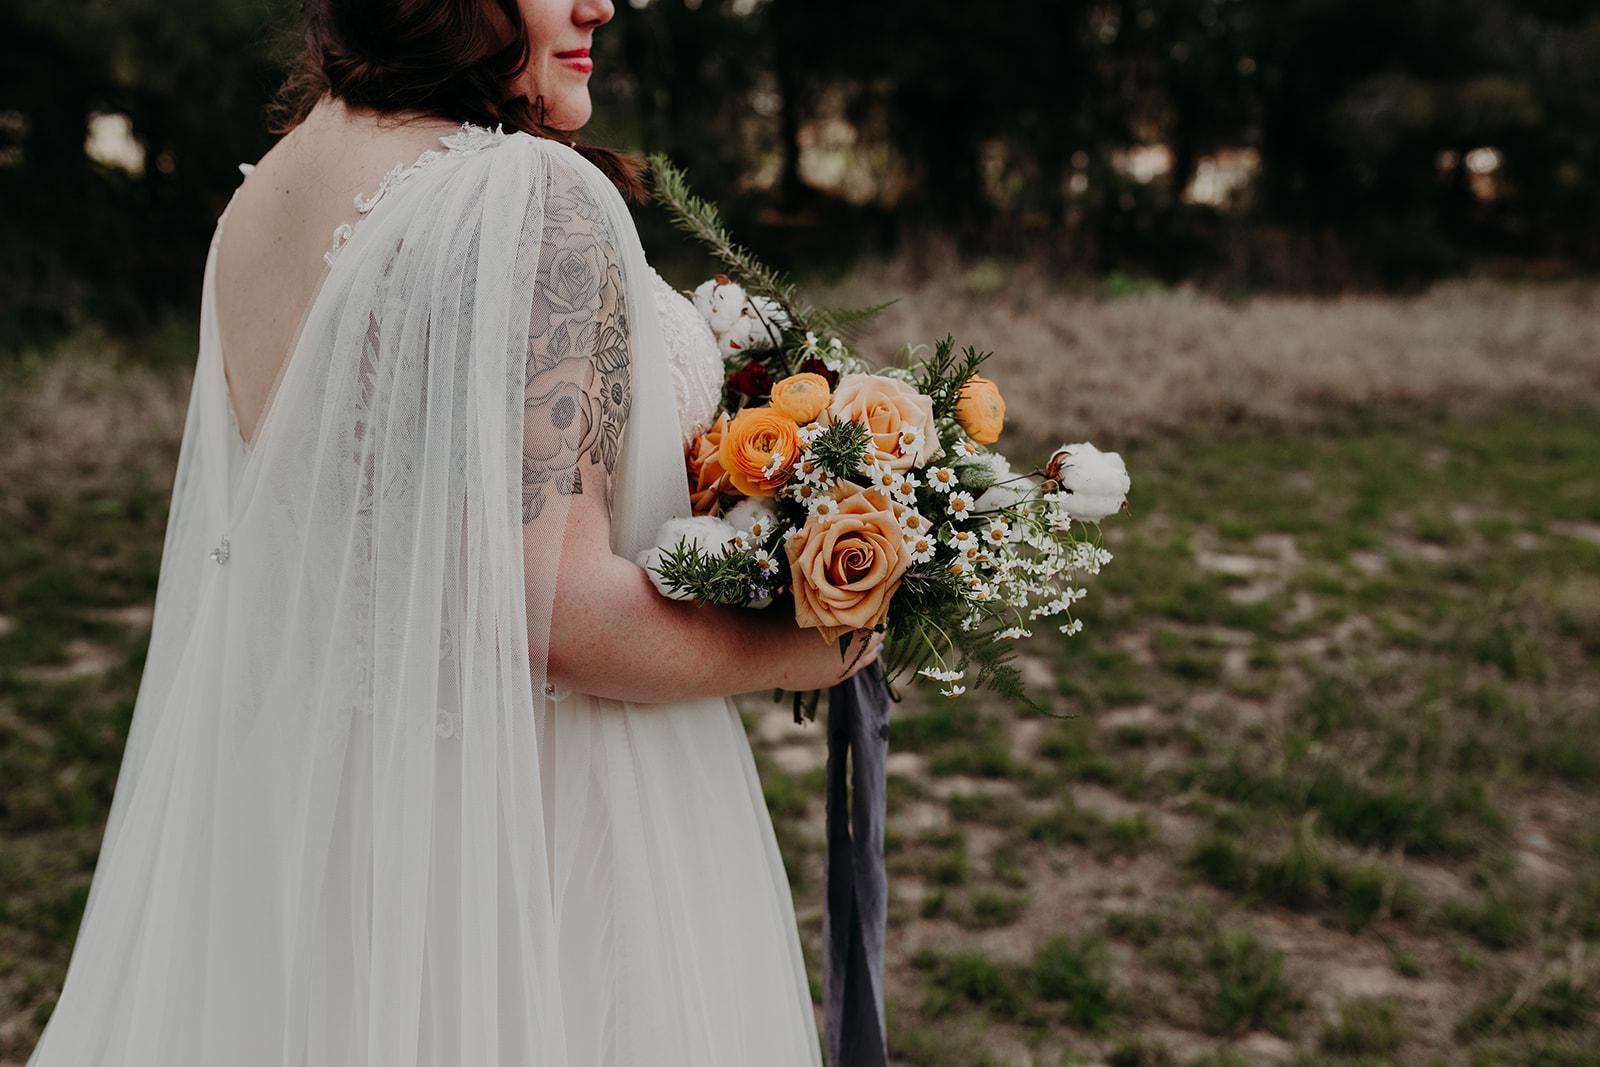 Disney Themed Wedding - Arizona florist Phoenix scottsdale Mesa chandler Sedona Flagstaff Prescott - Wedding Day Style Inspiration - Bridal Cape